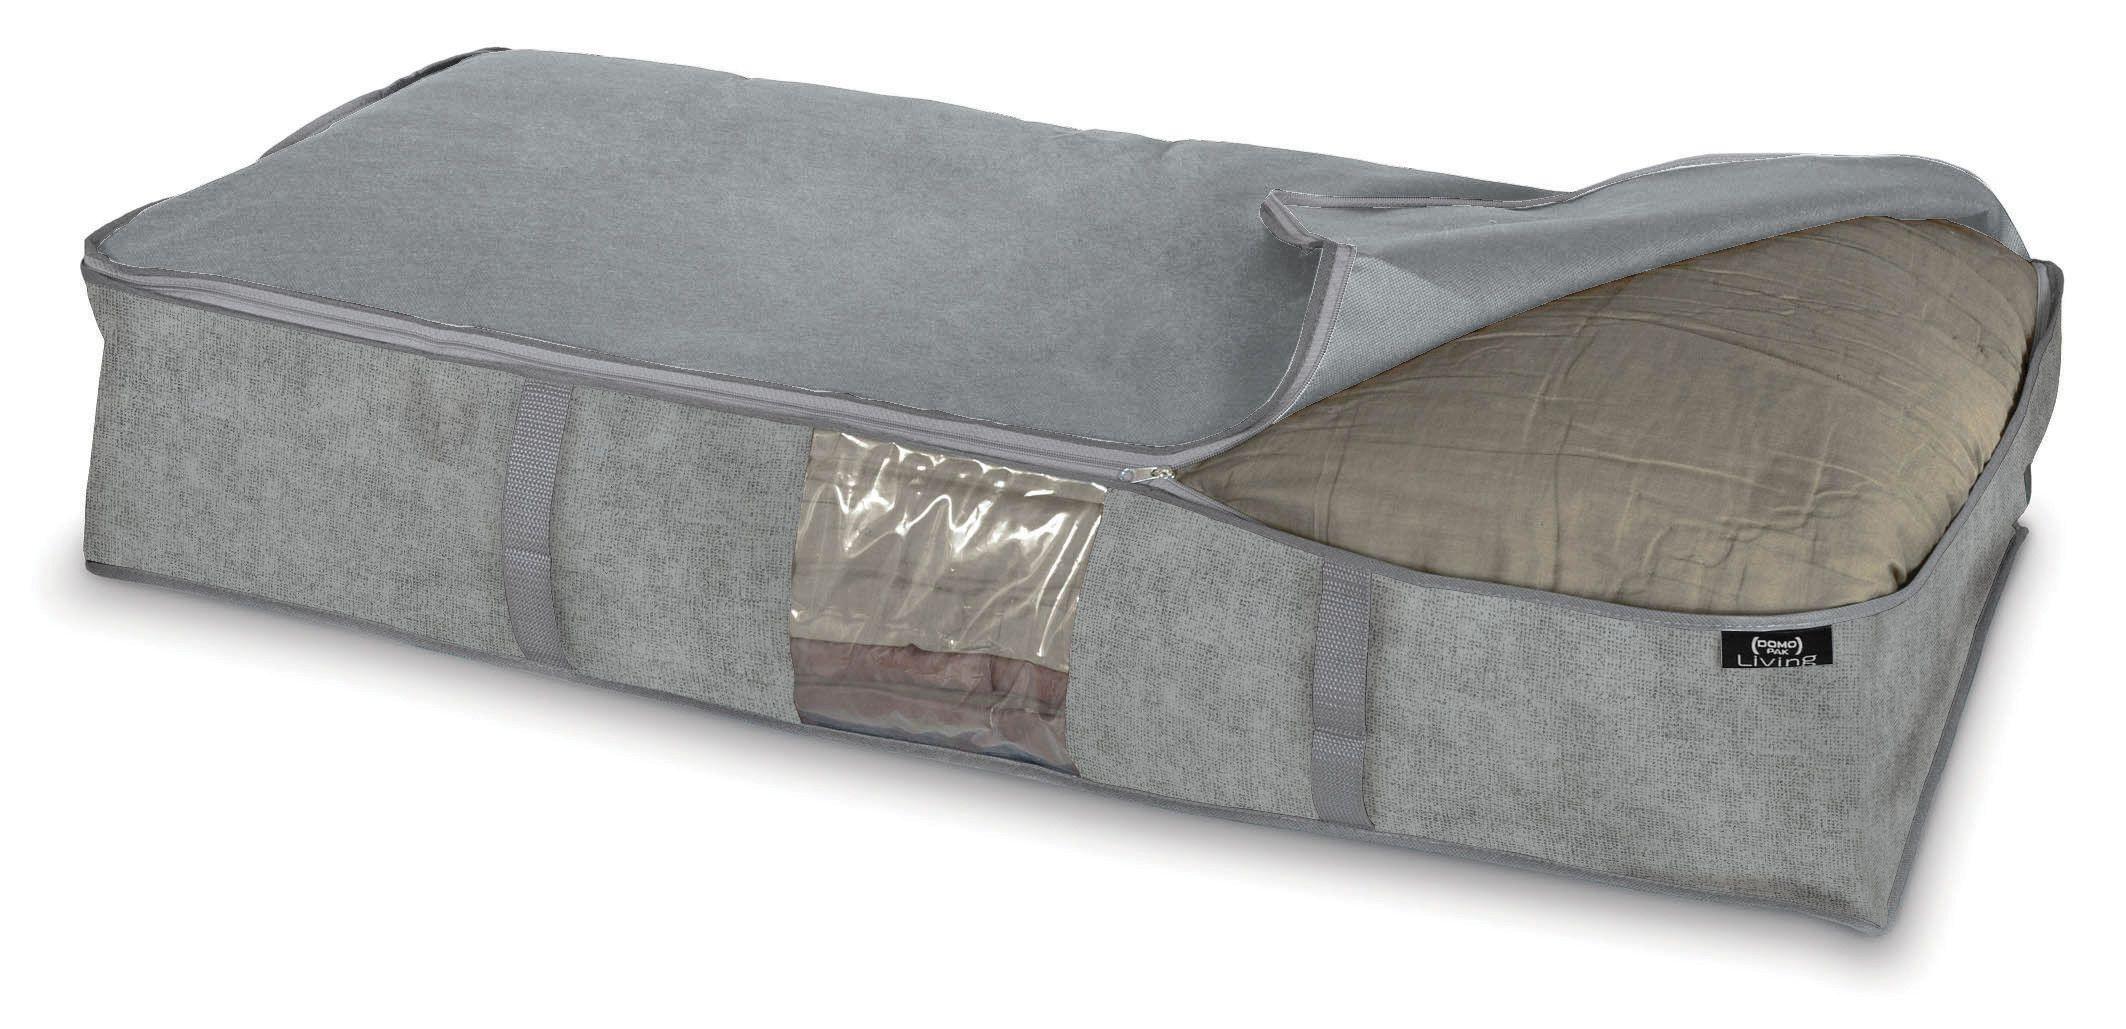 Organizator textil pliabil cu fermoar, Stone XL Gri, L95xl45xH18 cm imagine